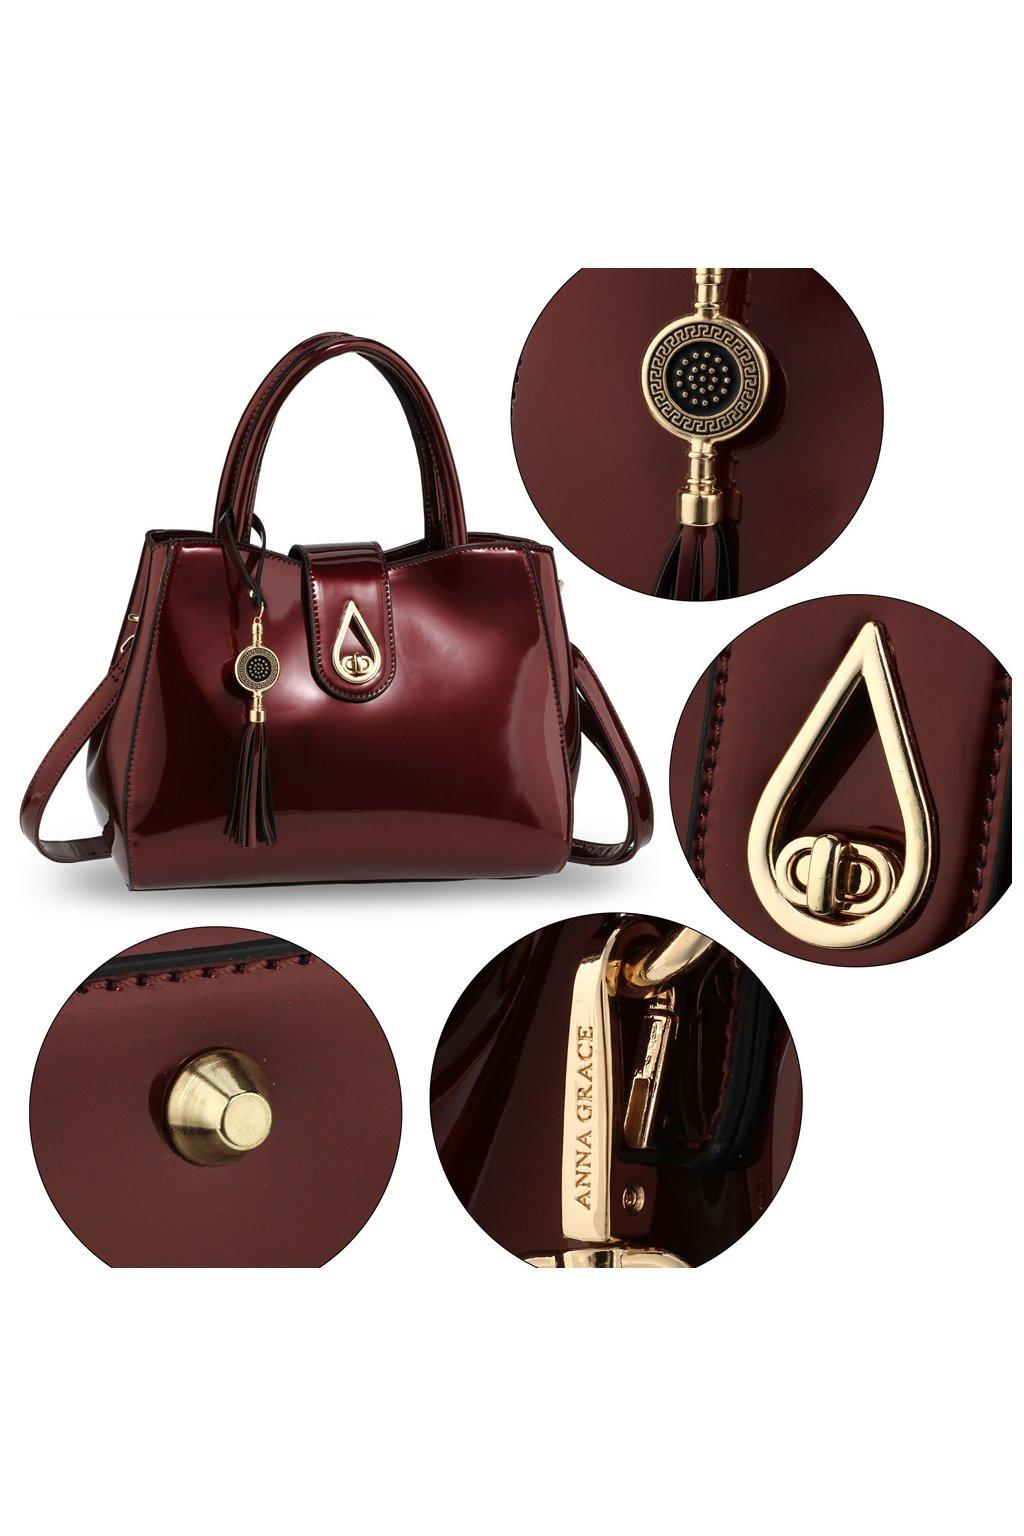 Trendy kabelka do ruky Lilliana bordová AG00650 1a92131bbfe